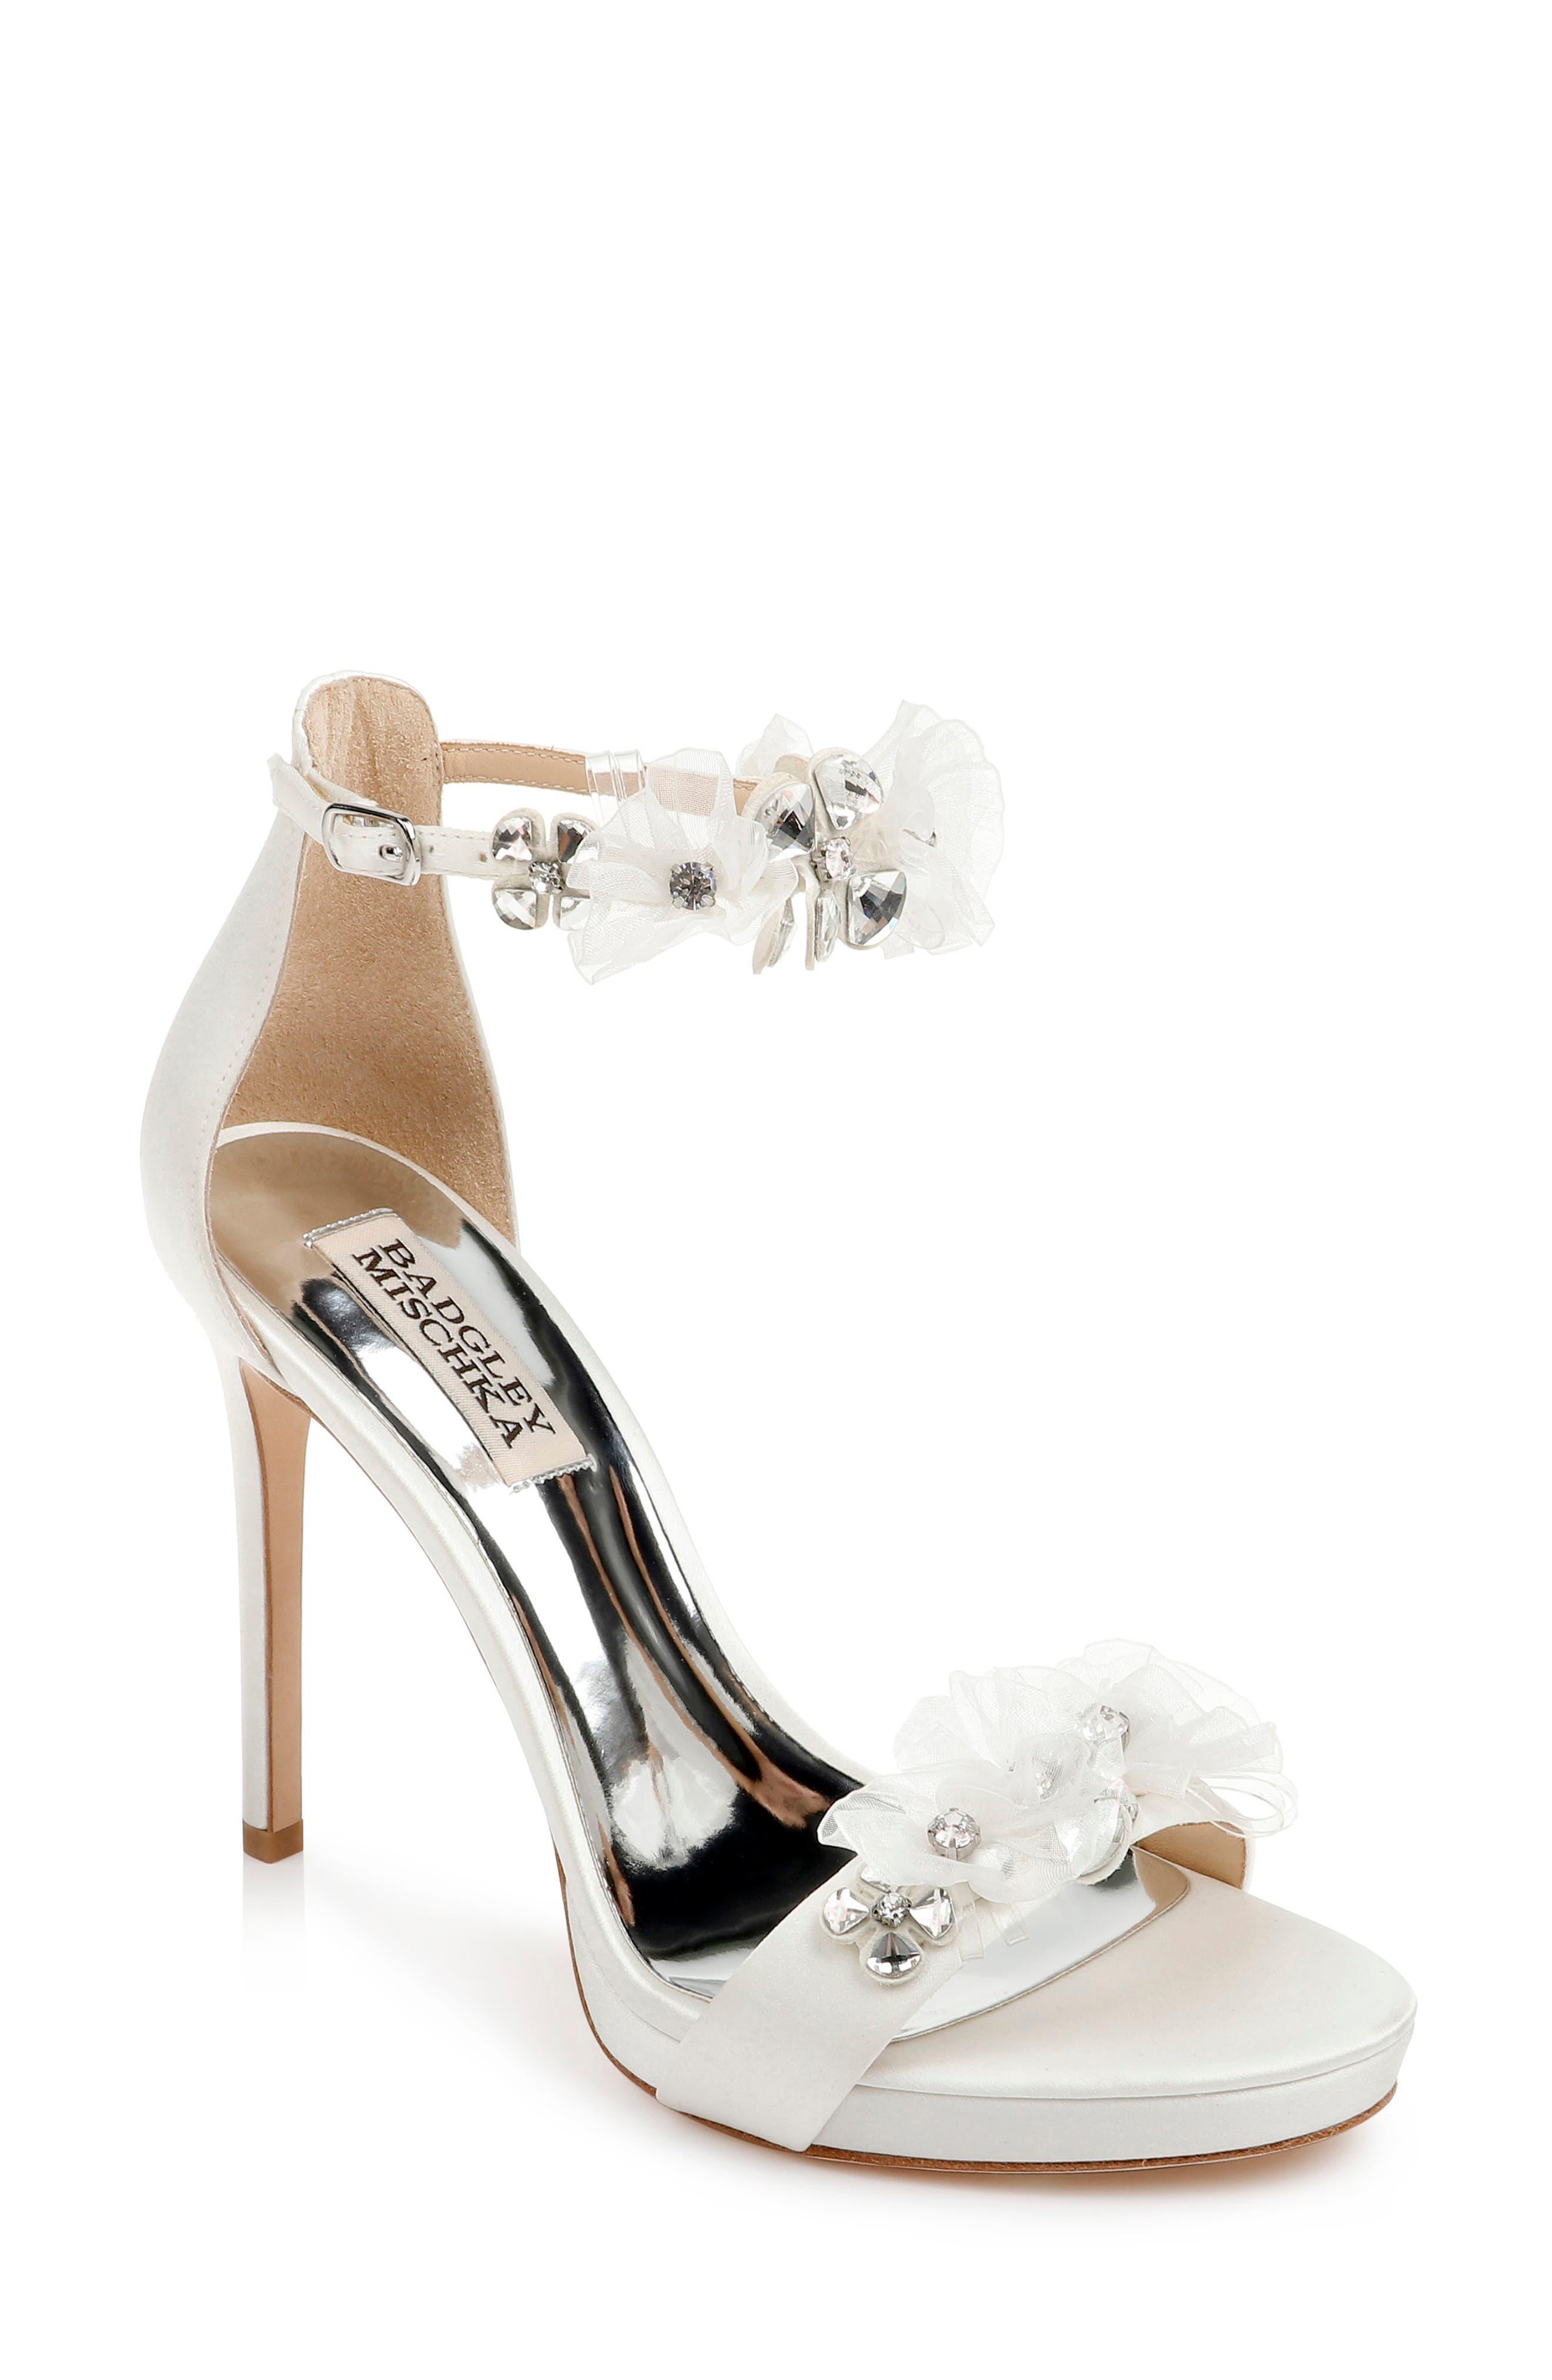 Badgley Mischka Womens Cardi Heeled Sandal